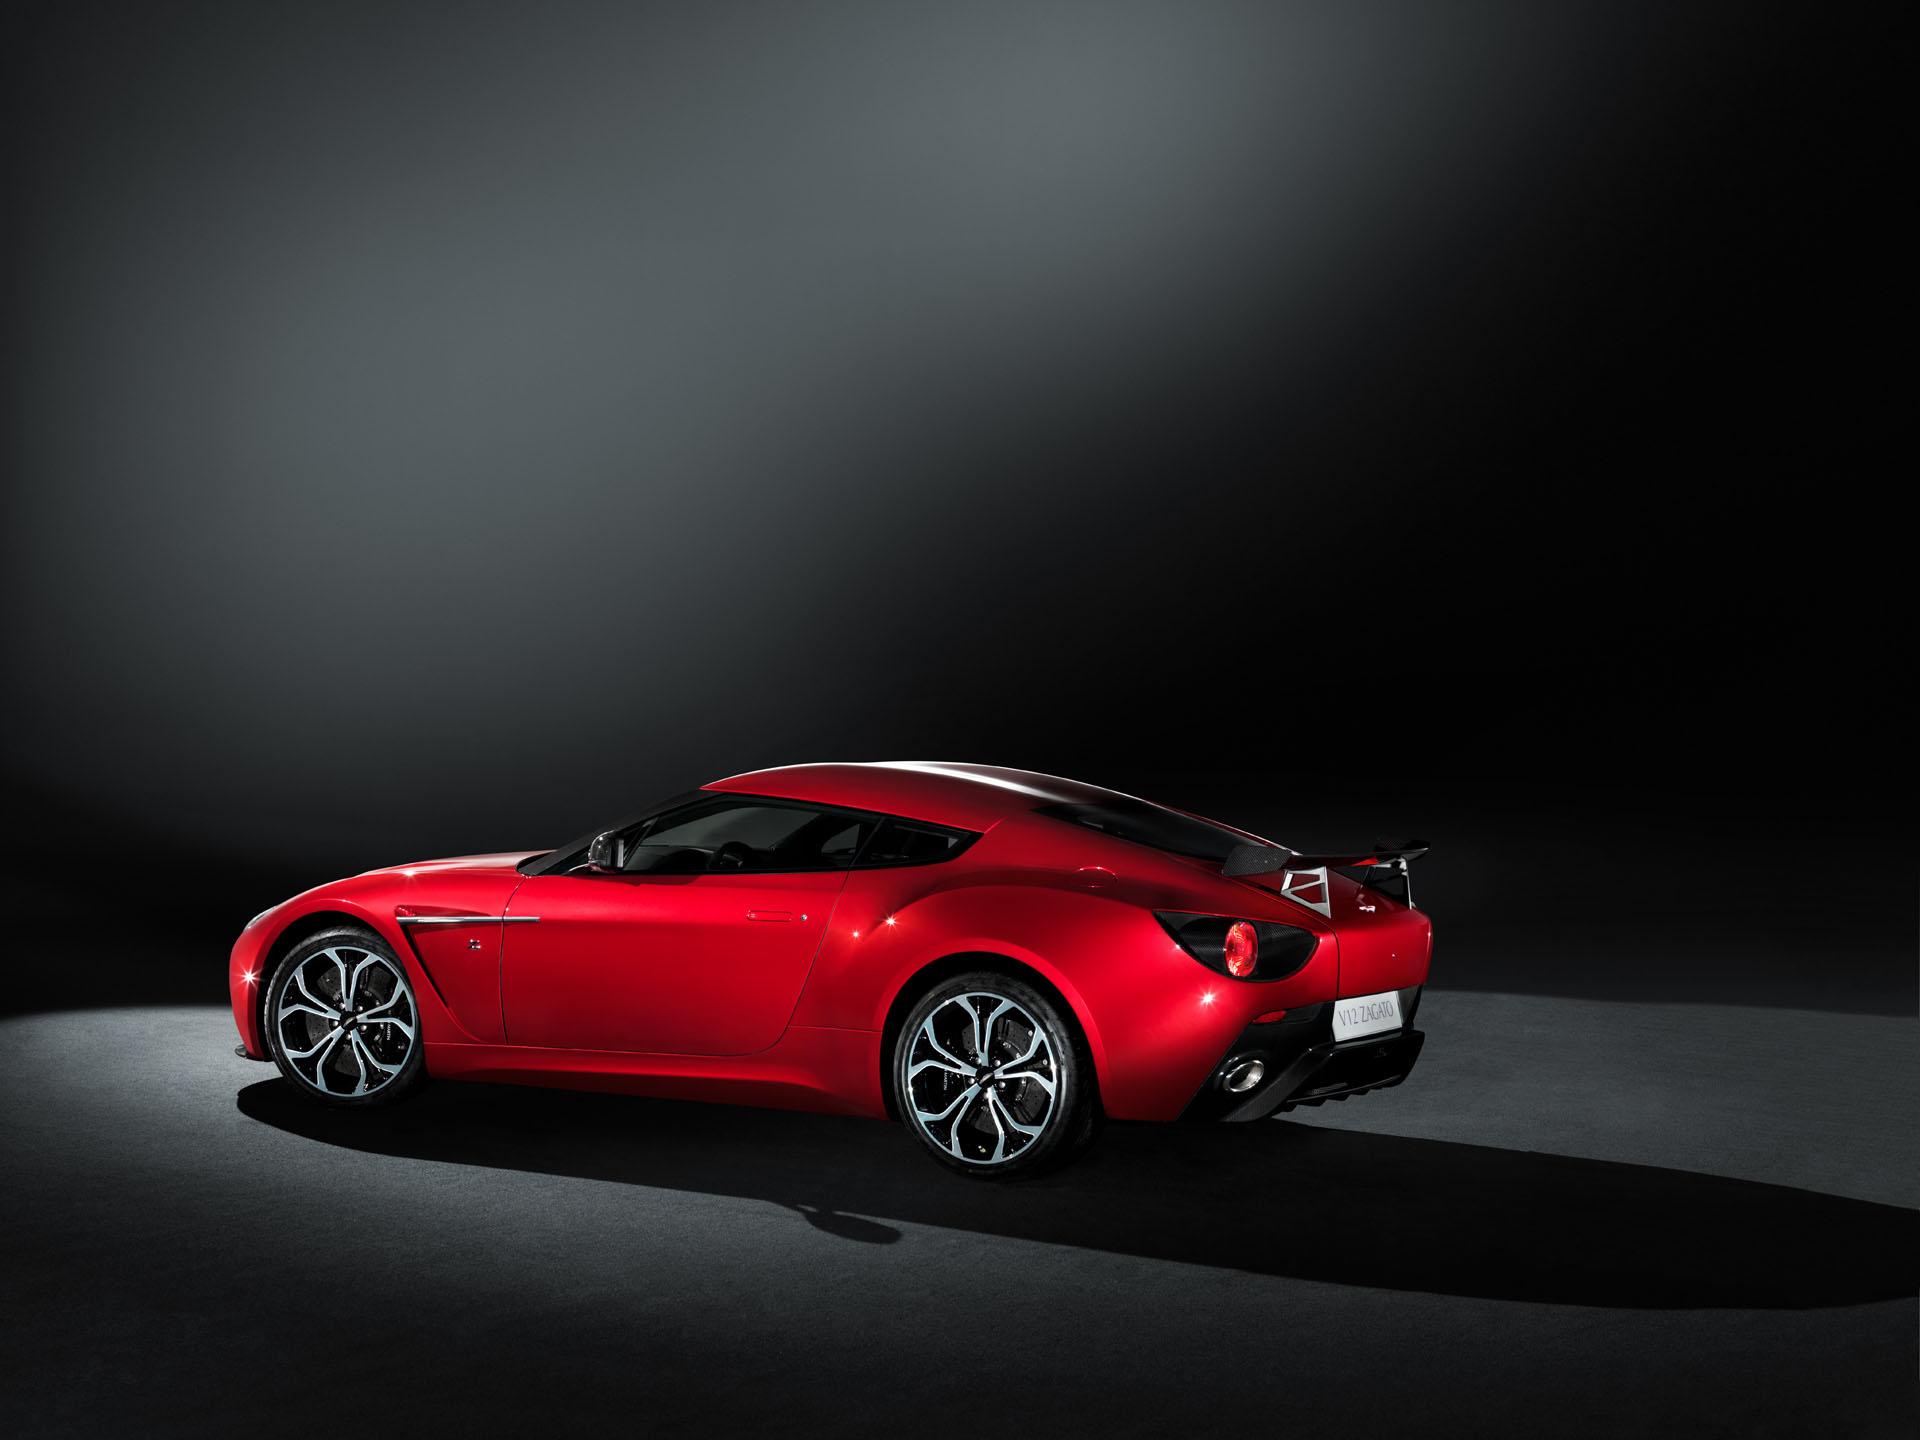 Aston Martin V12 Zagato – krása pro vyvolené